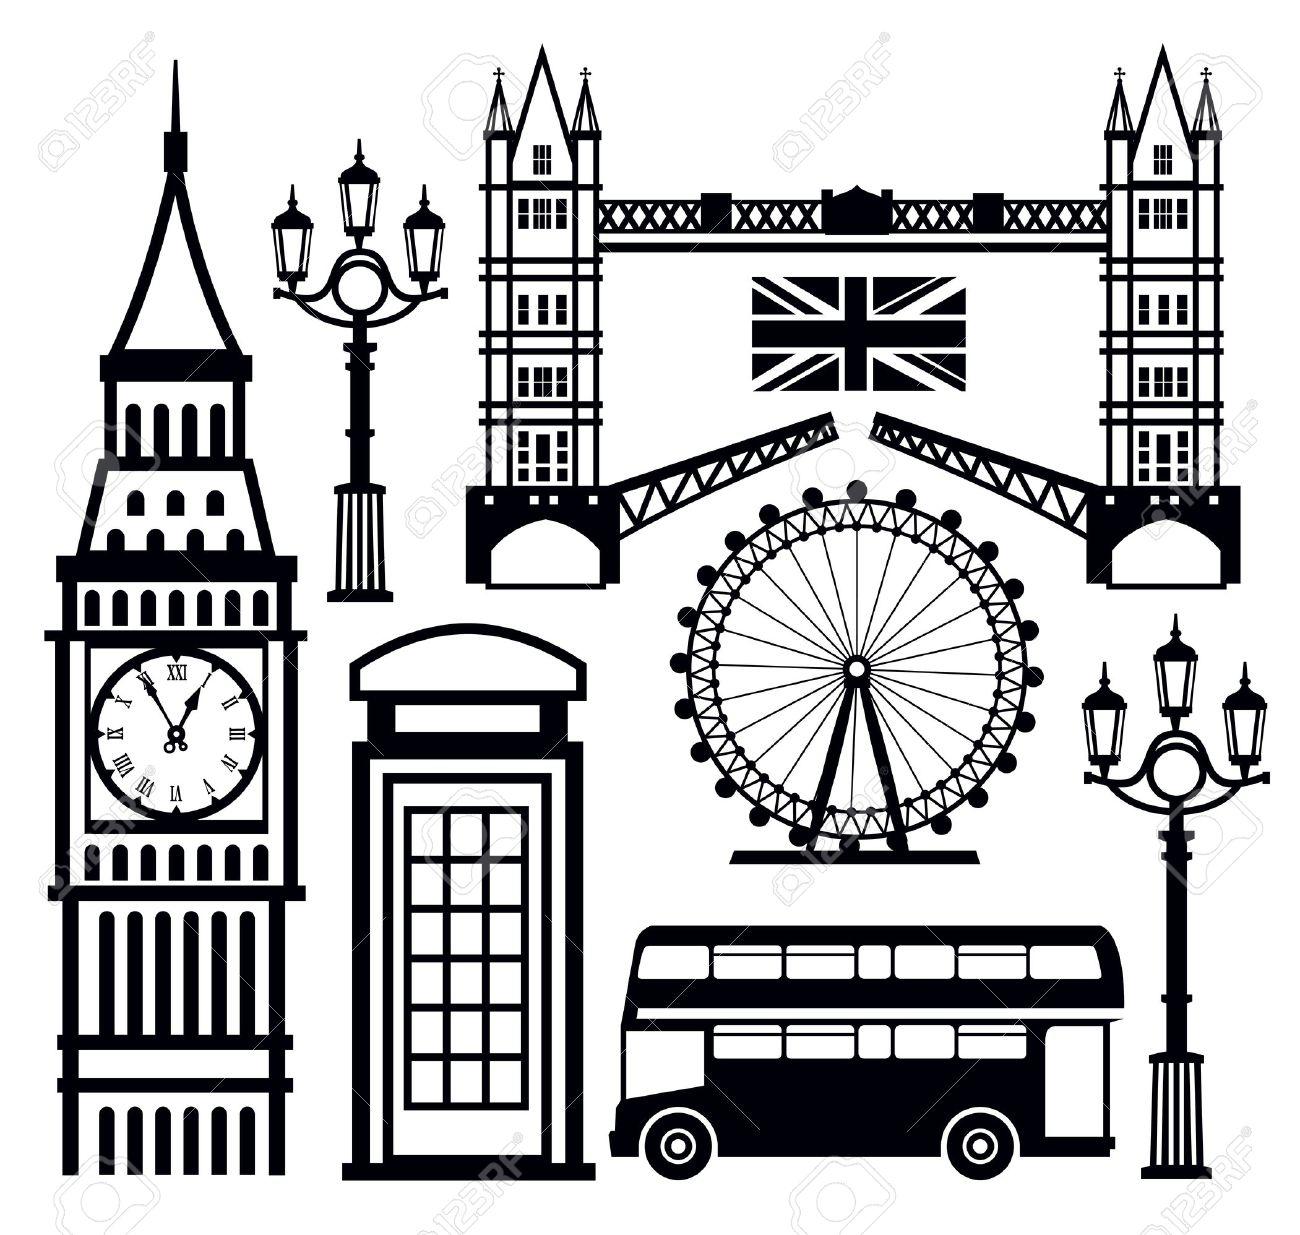 london icon Stock Vector - 18902689